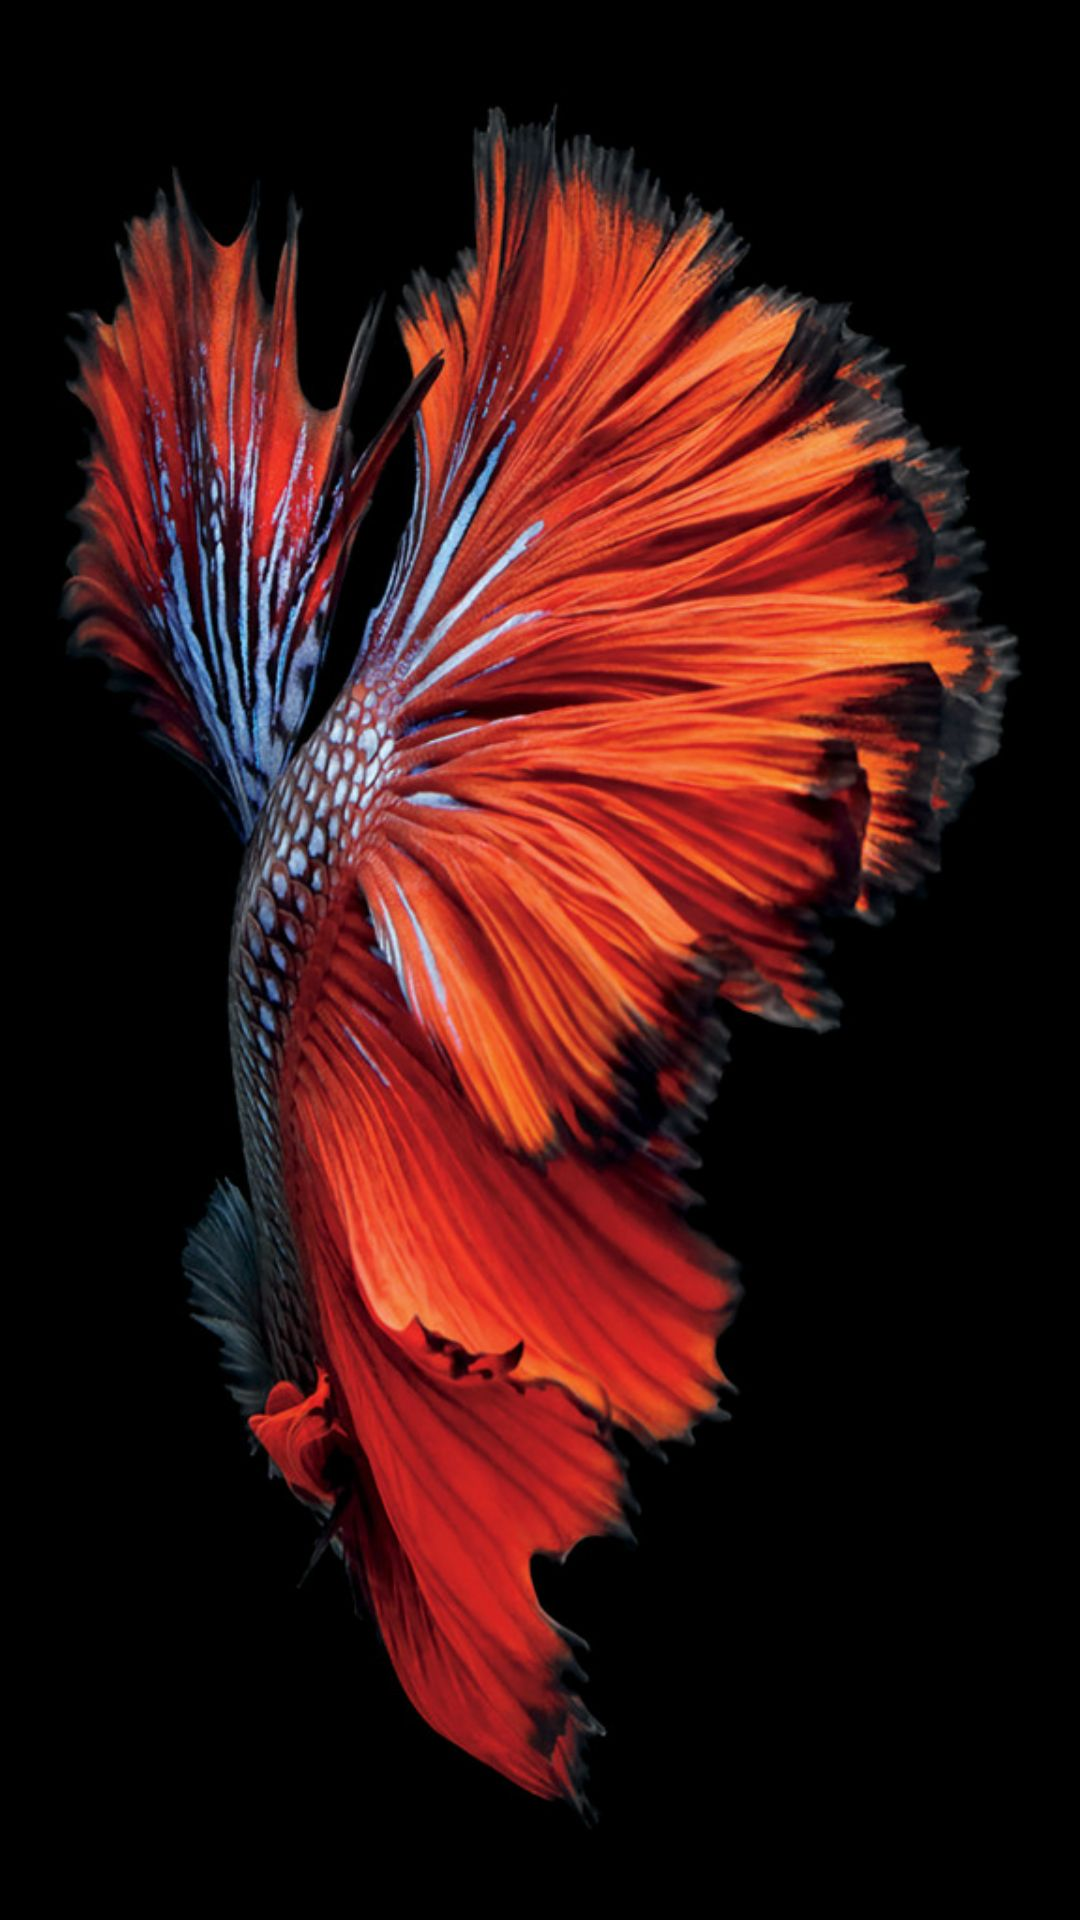 Ios9 Red Fish Artwork Pattern Dark Iphone 8 Wallpapers Live